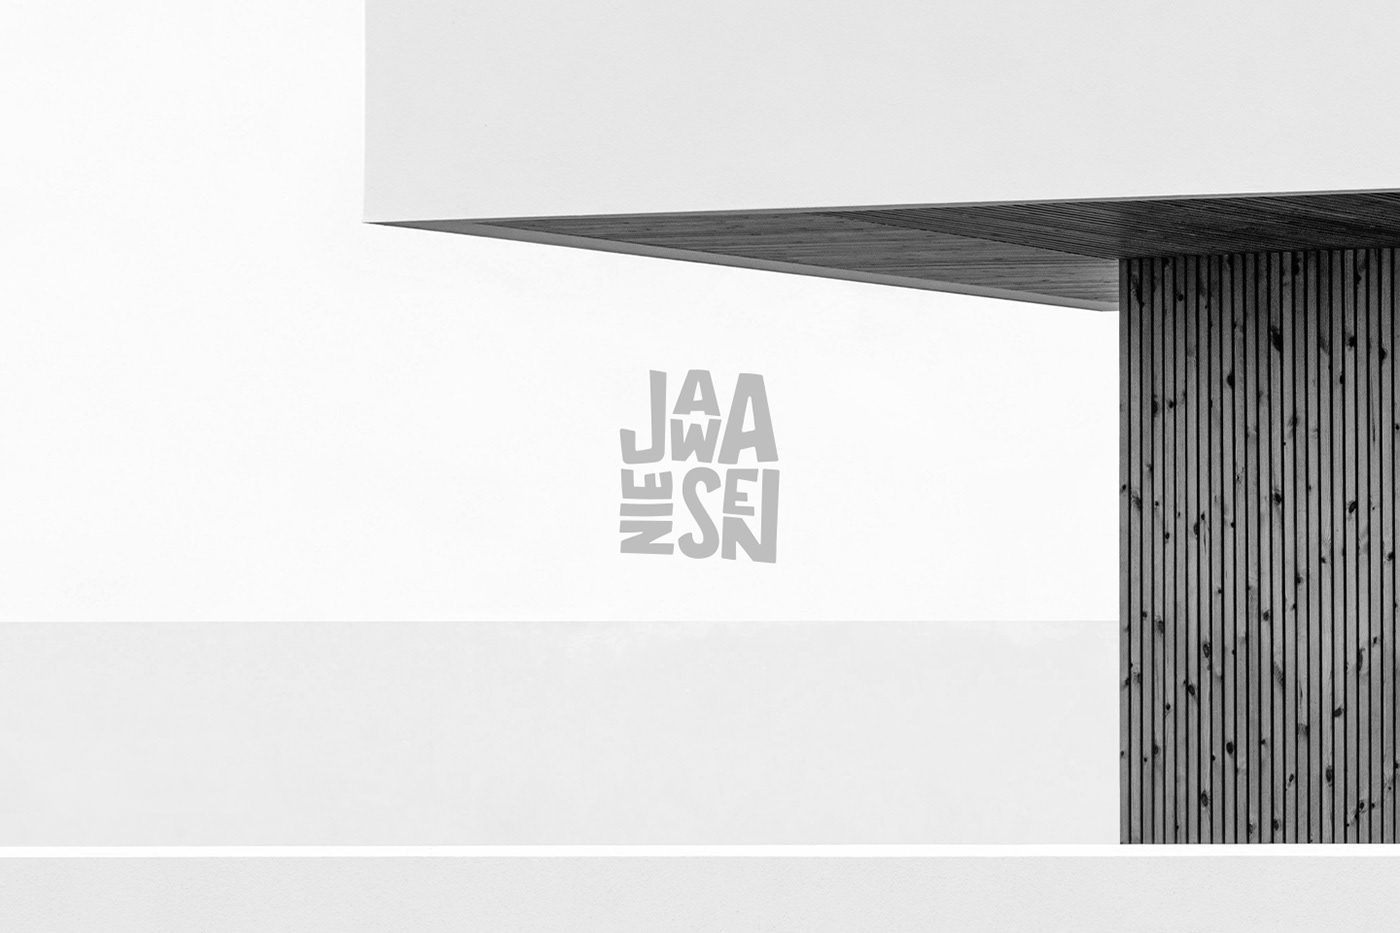 Jawa Nie Sen logo displayed in front of a geometric white building.